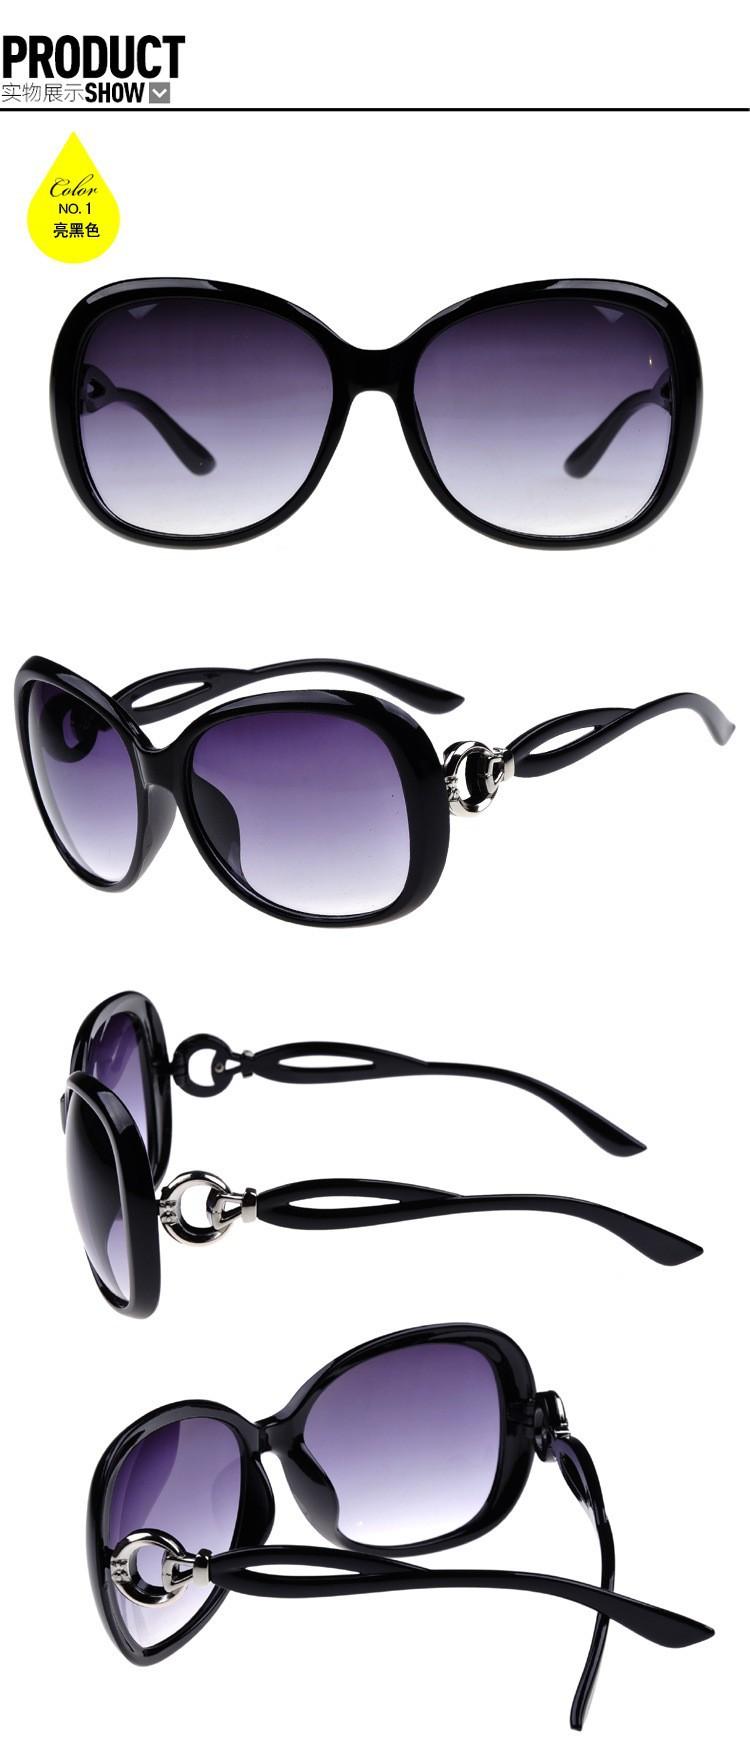 Fashion Sun Glasses Super Star Girls Cool Summer Large Round Shape